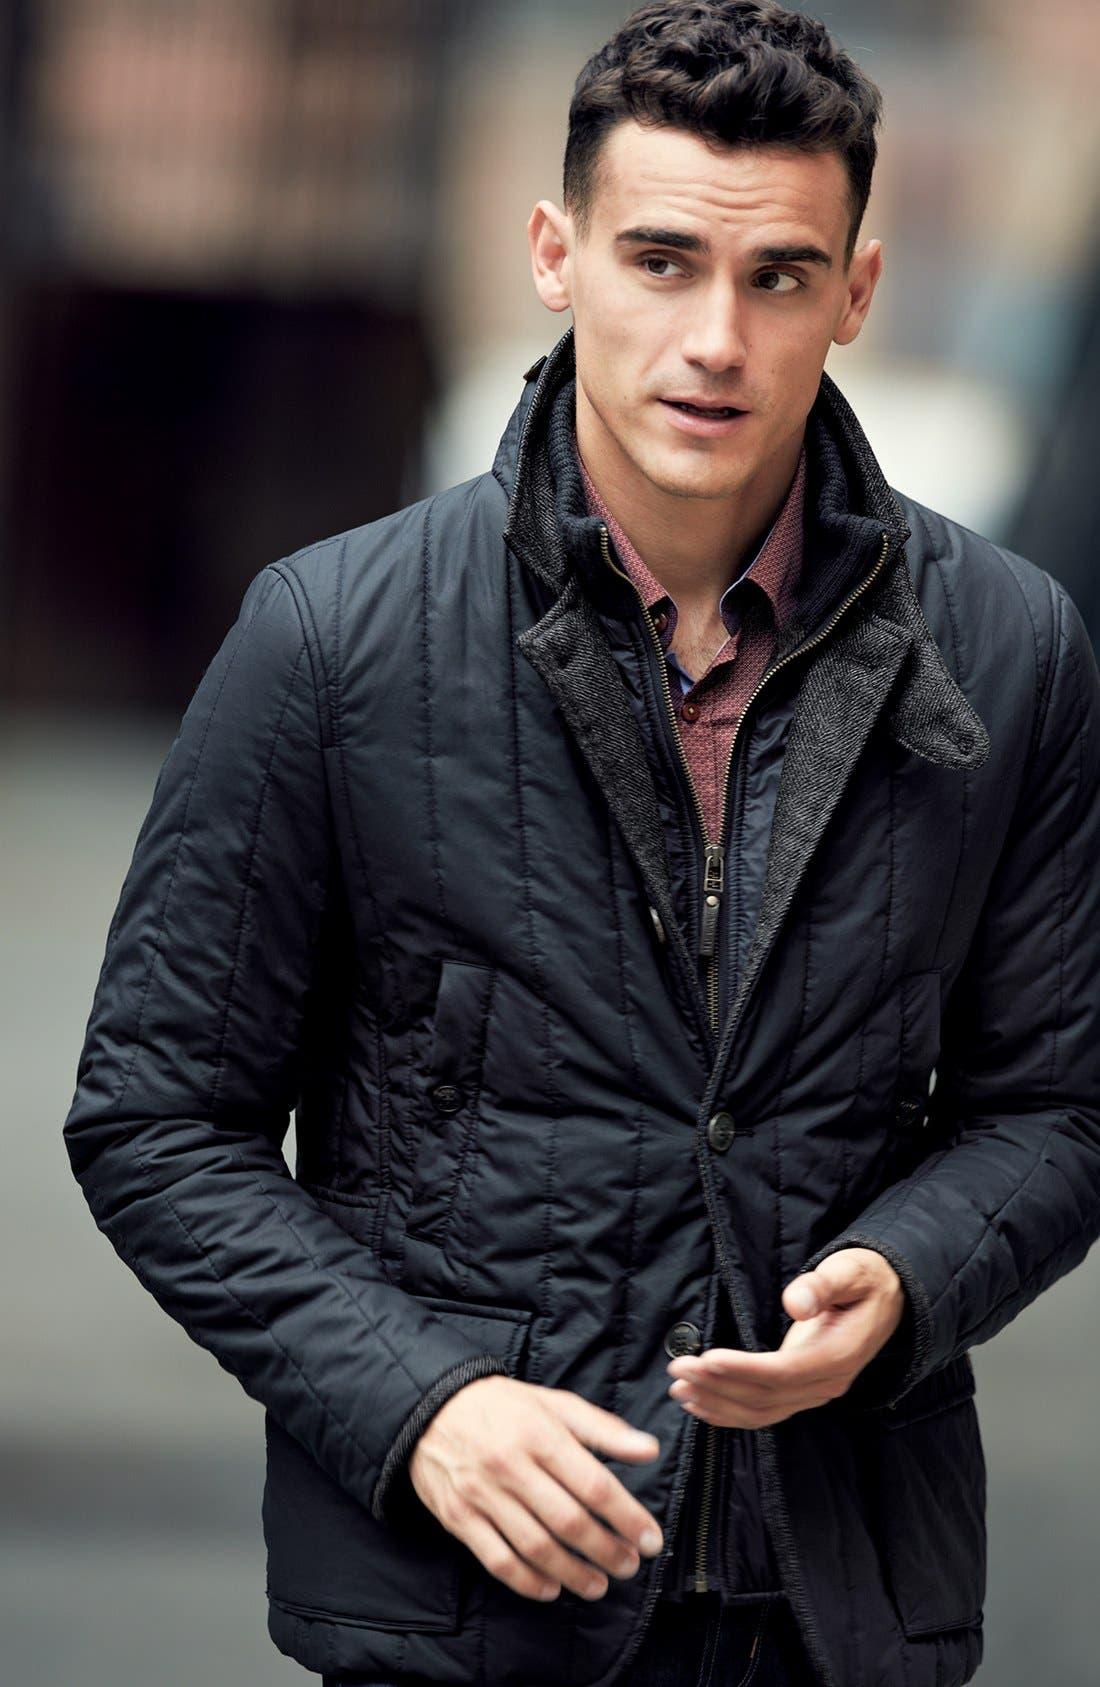 Alternate Image 1 Selected - Ted Baker London Quilted Jacket & Trim Fit Sport Shirt